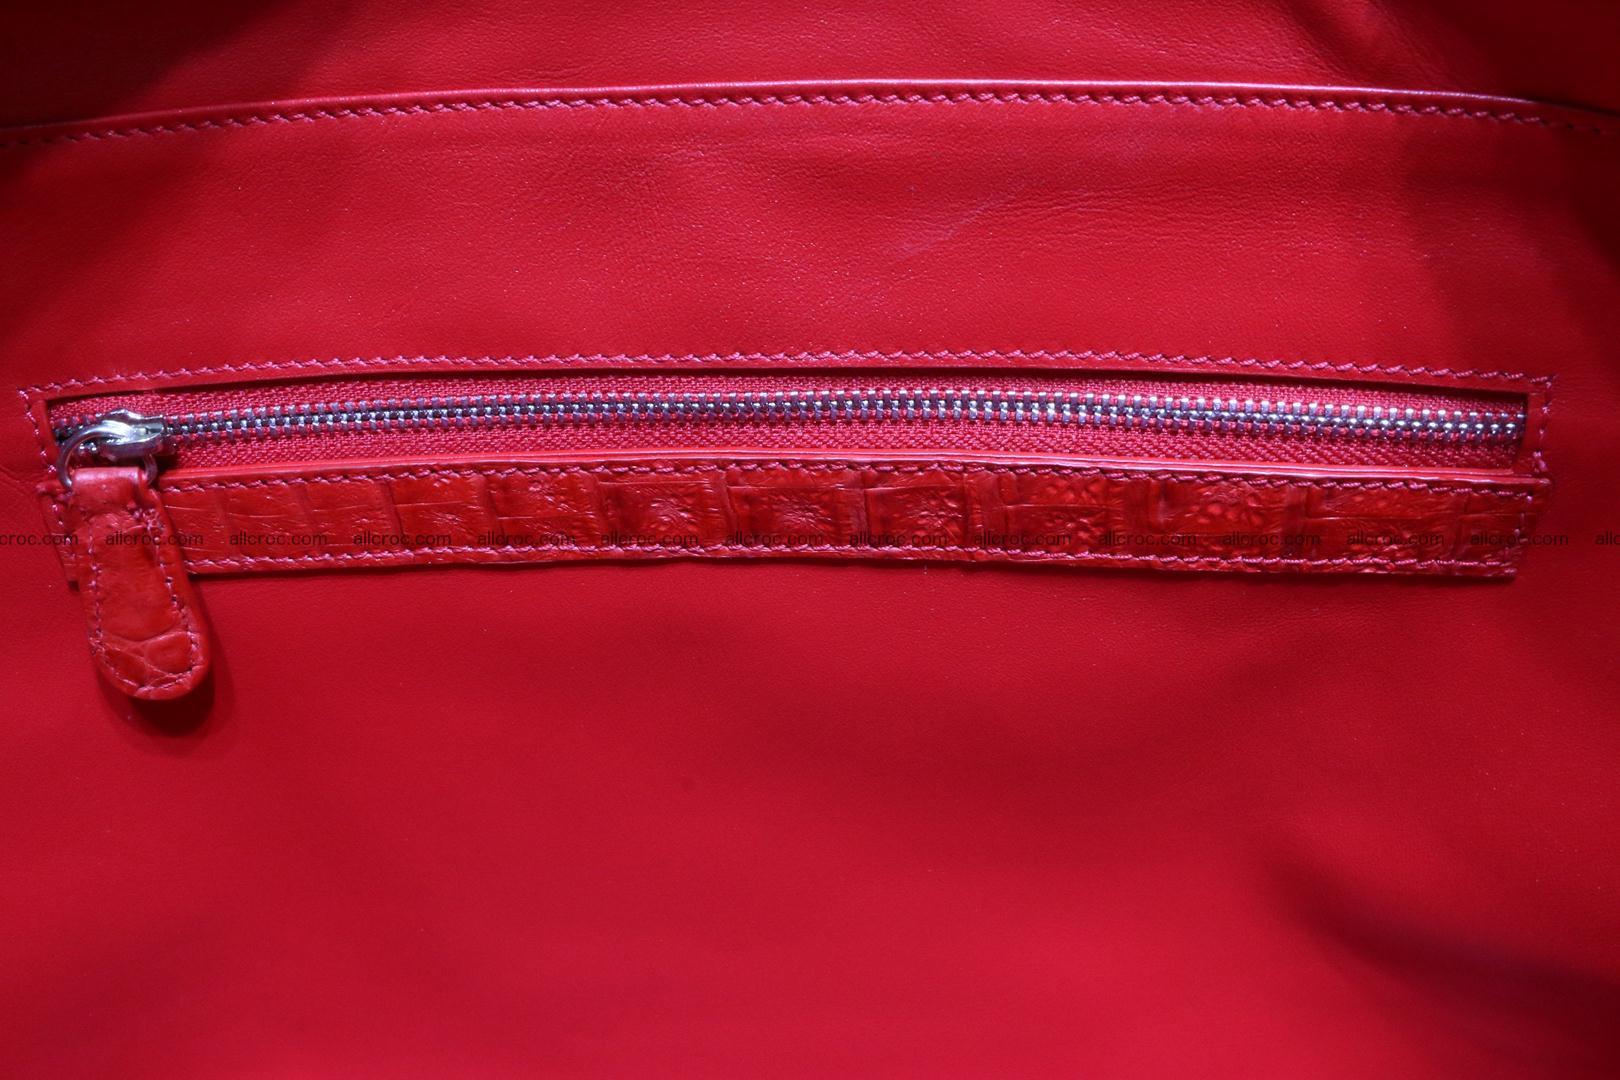 Genuine crocodile leather women's bag 062 Foto 14